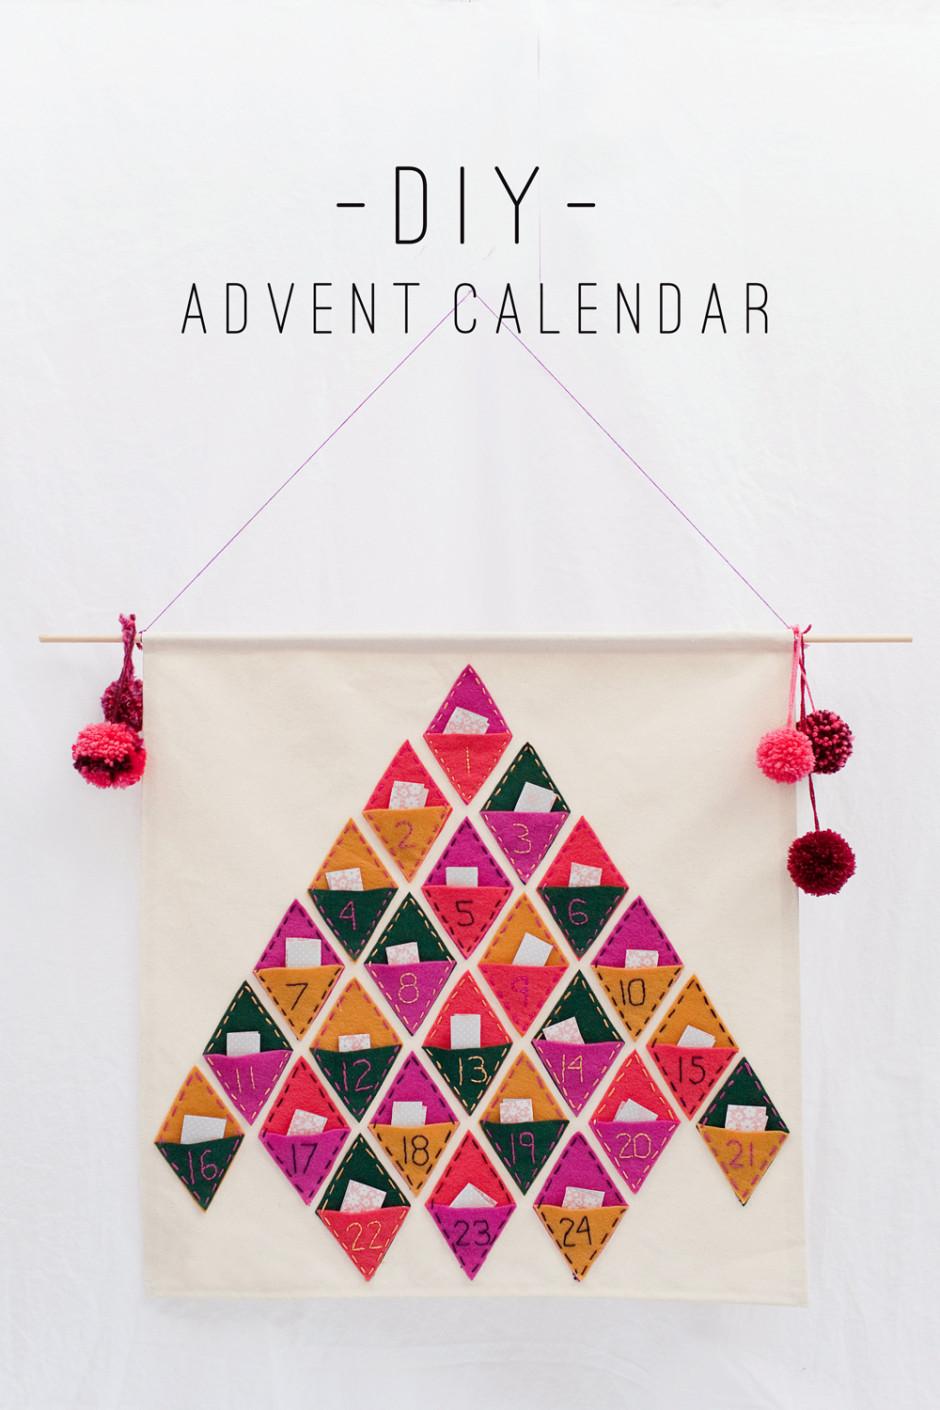 Diy Love Calendar : Tell diy advent calendar love and partytell